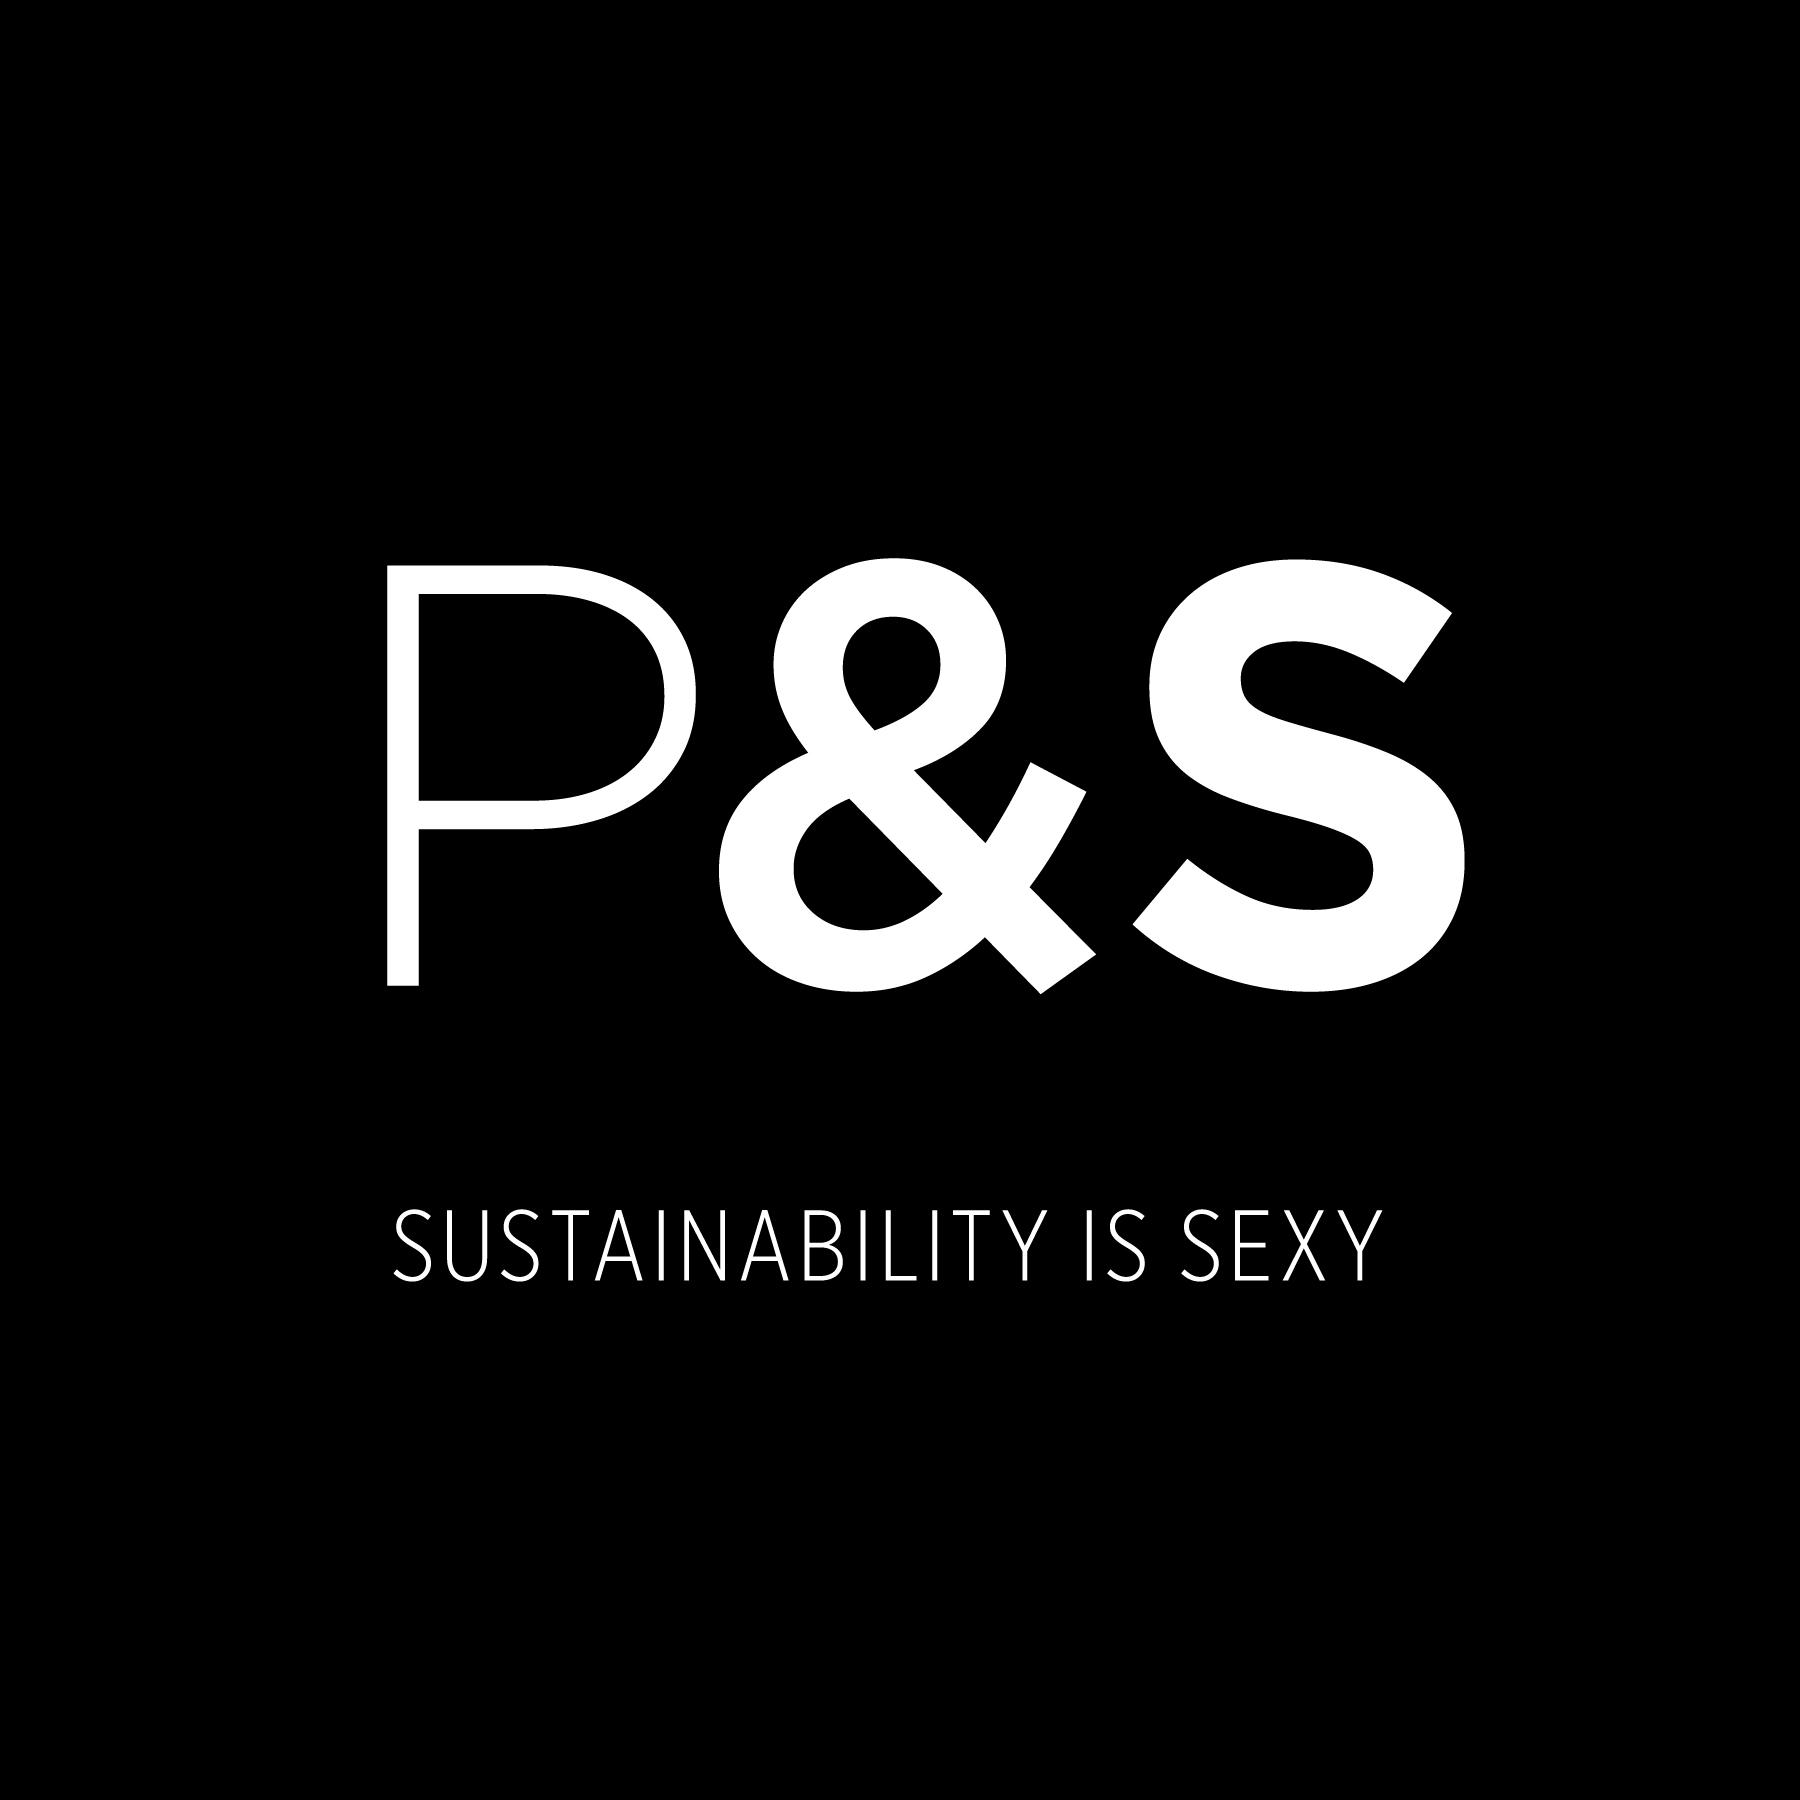 P&S Logo - Sustainability is Sexy.jpg